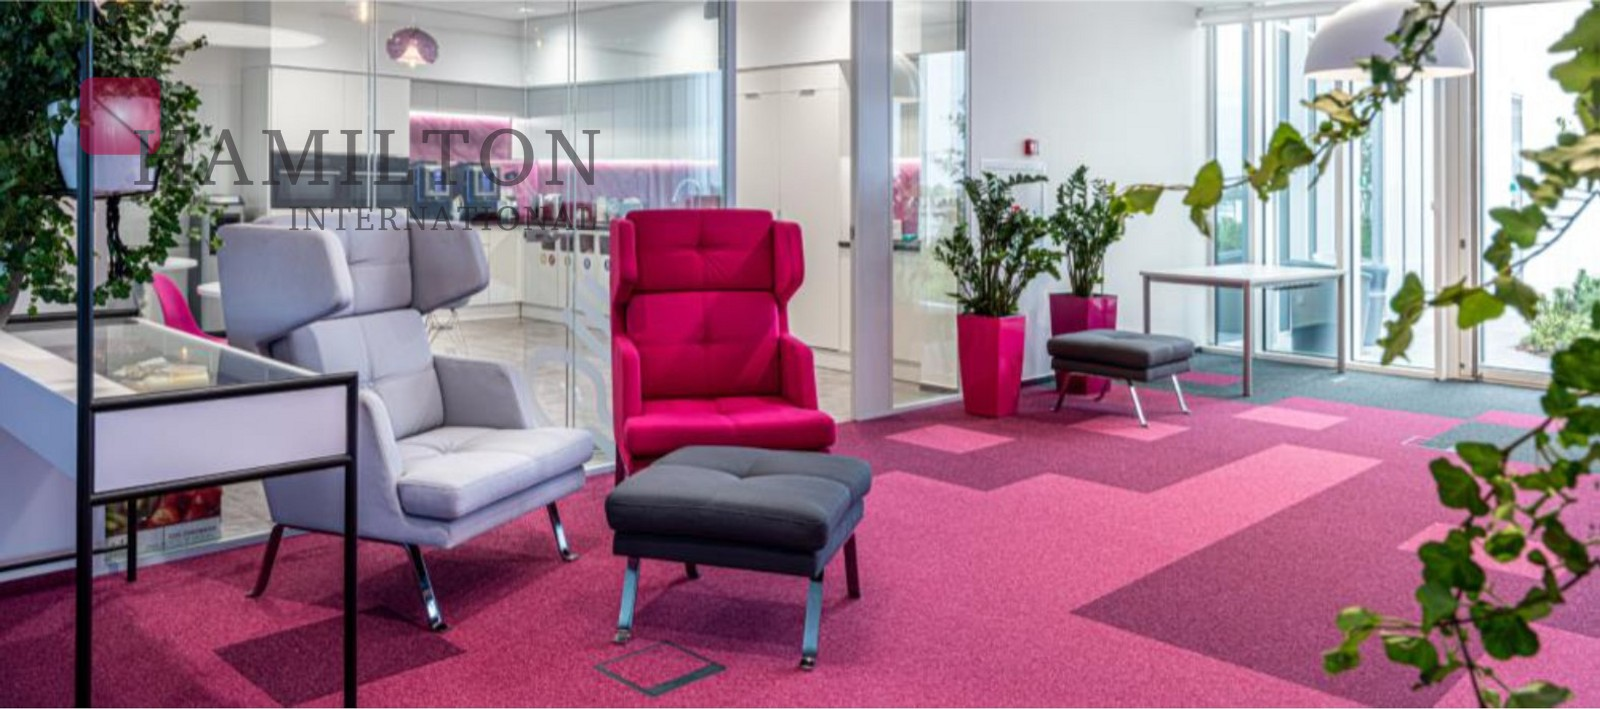 Beautiful office! Warsaw - Włochy Warsaw office space photo